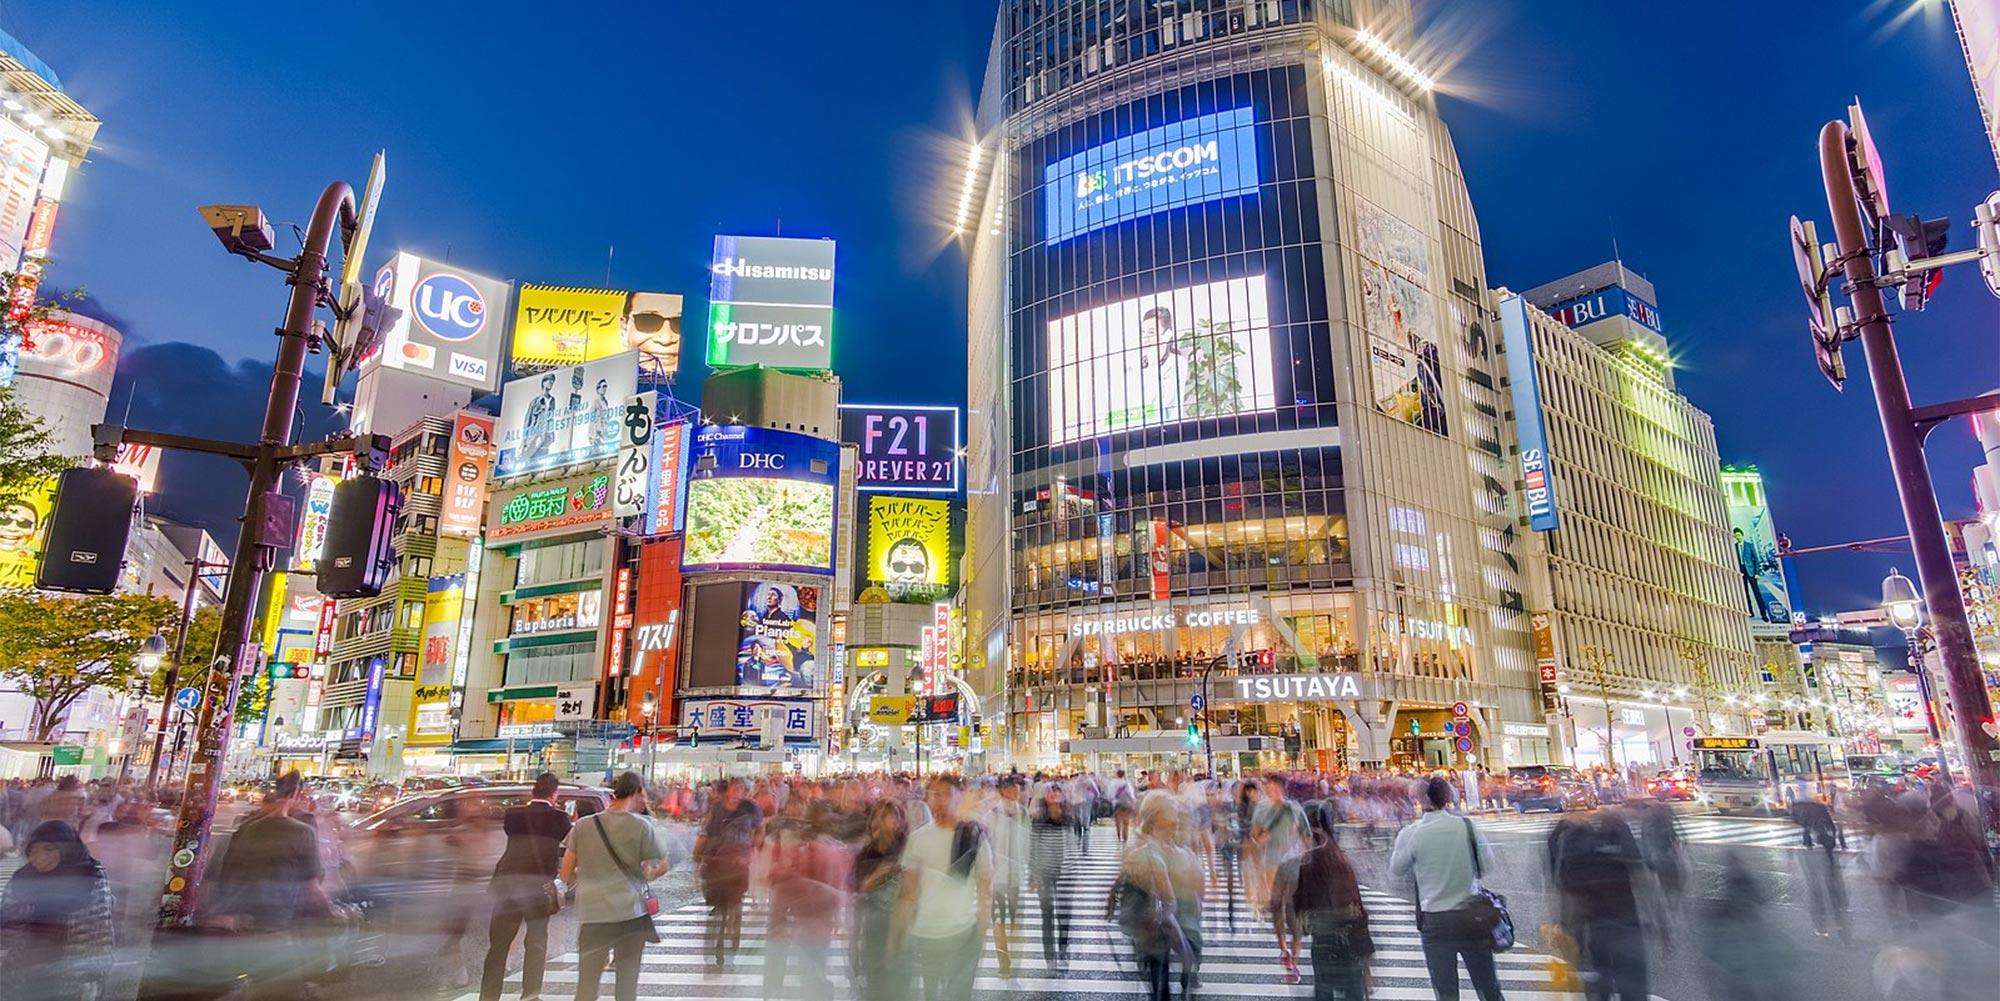 Shibuya Scramble Crossing